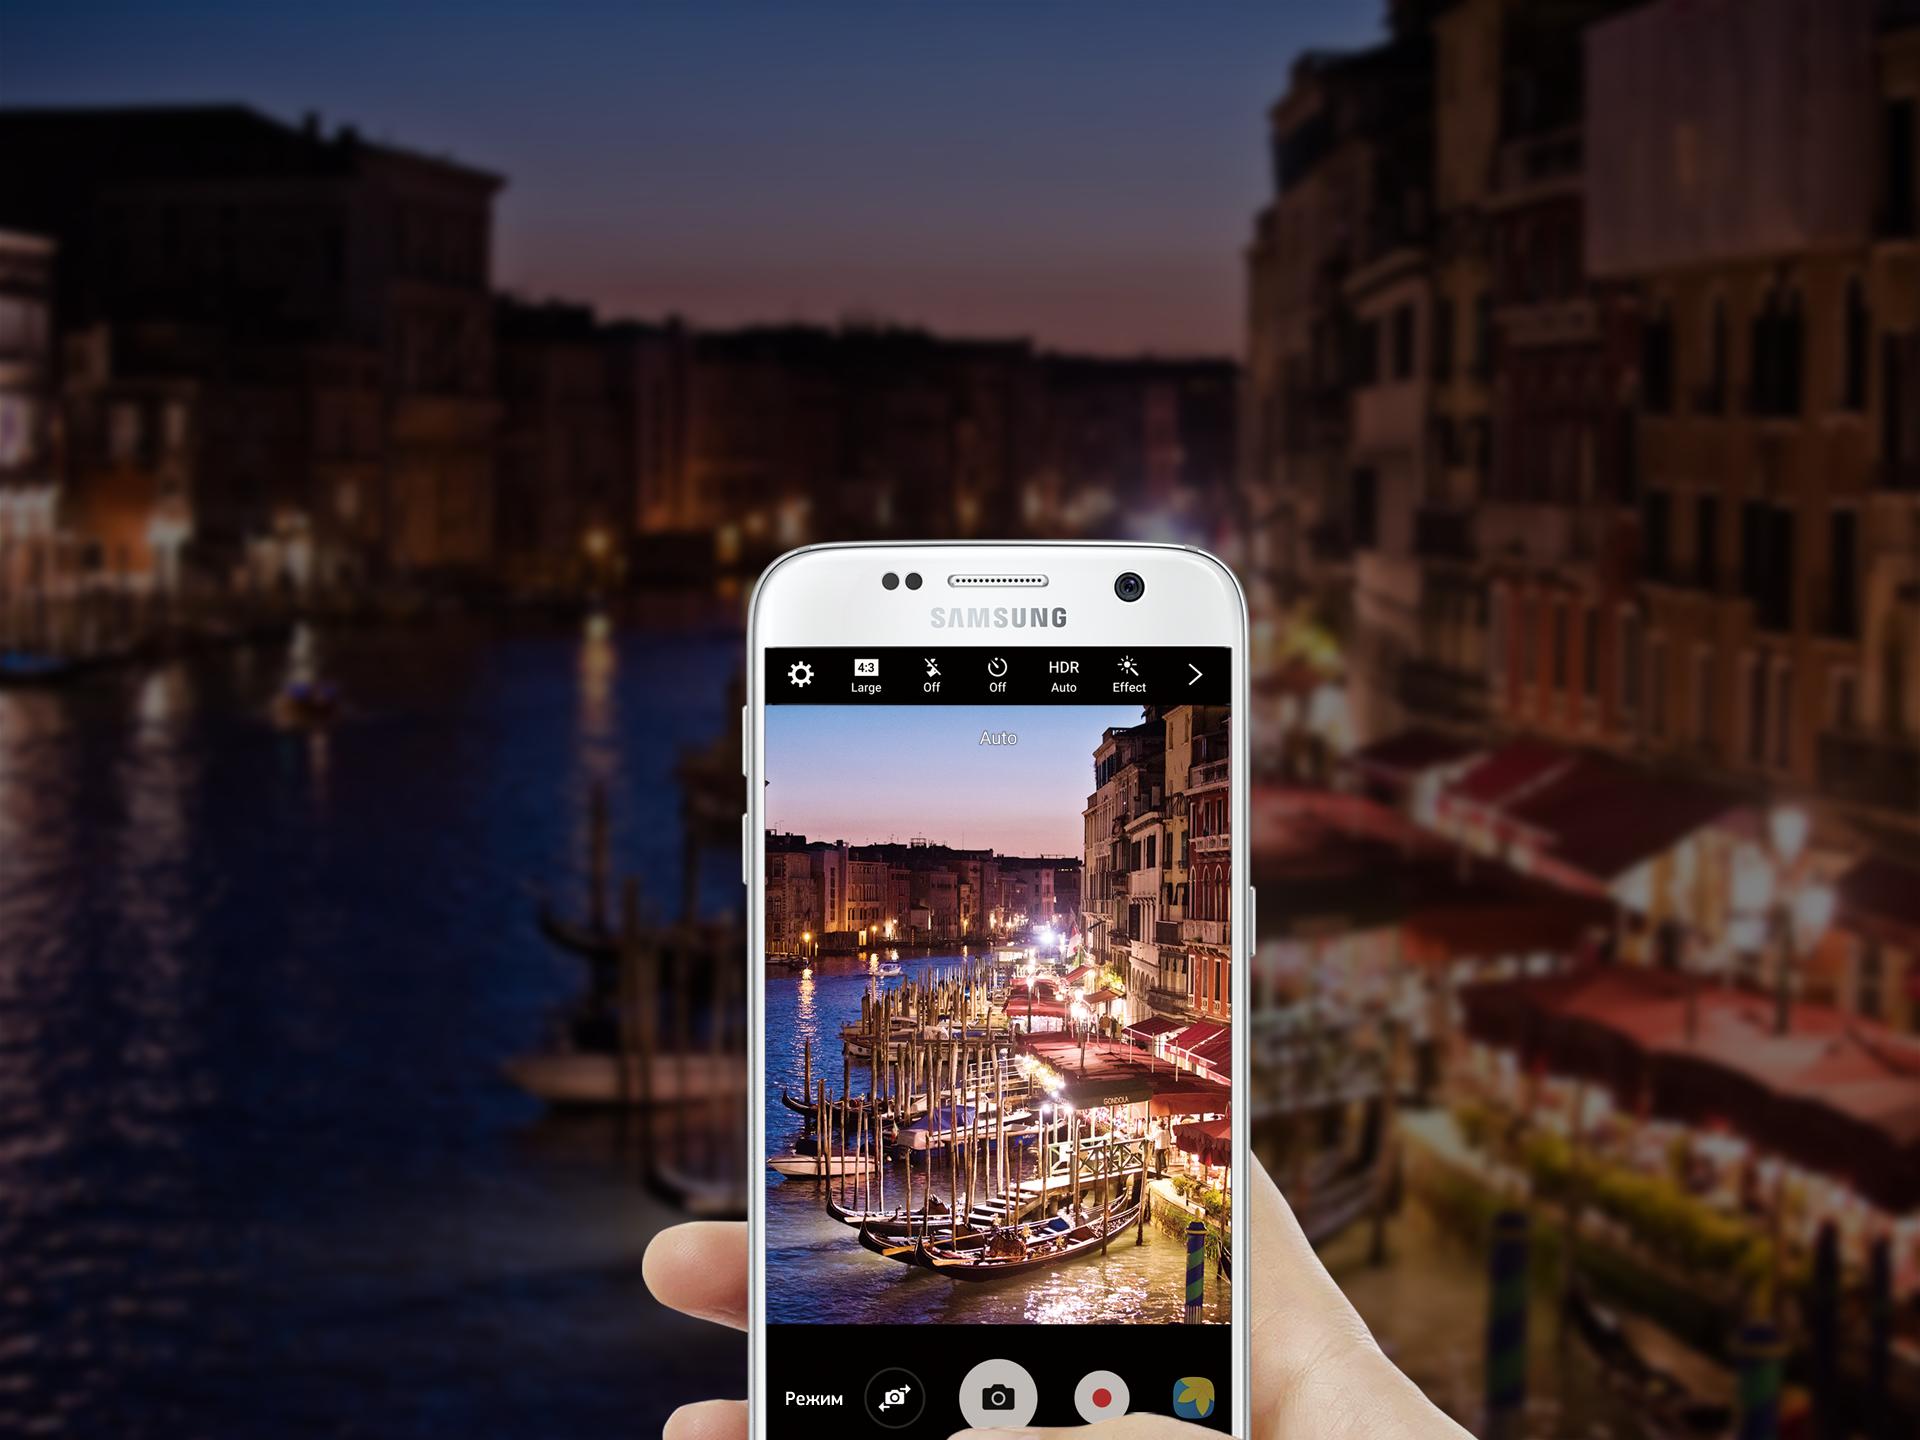 Galaxy S7 Edge в руке на фоне контрастного изображения